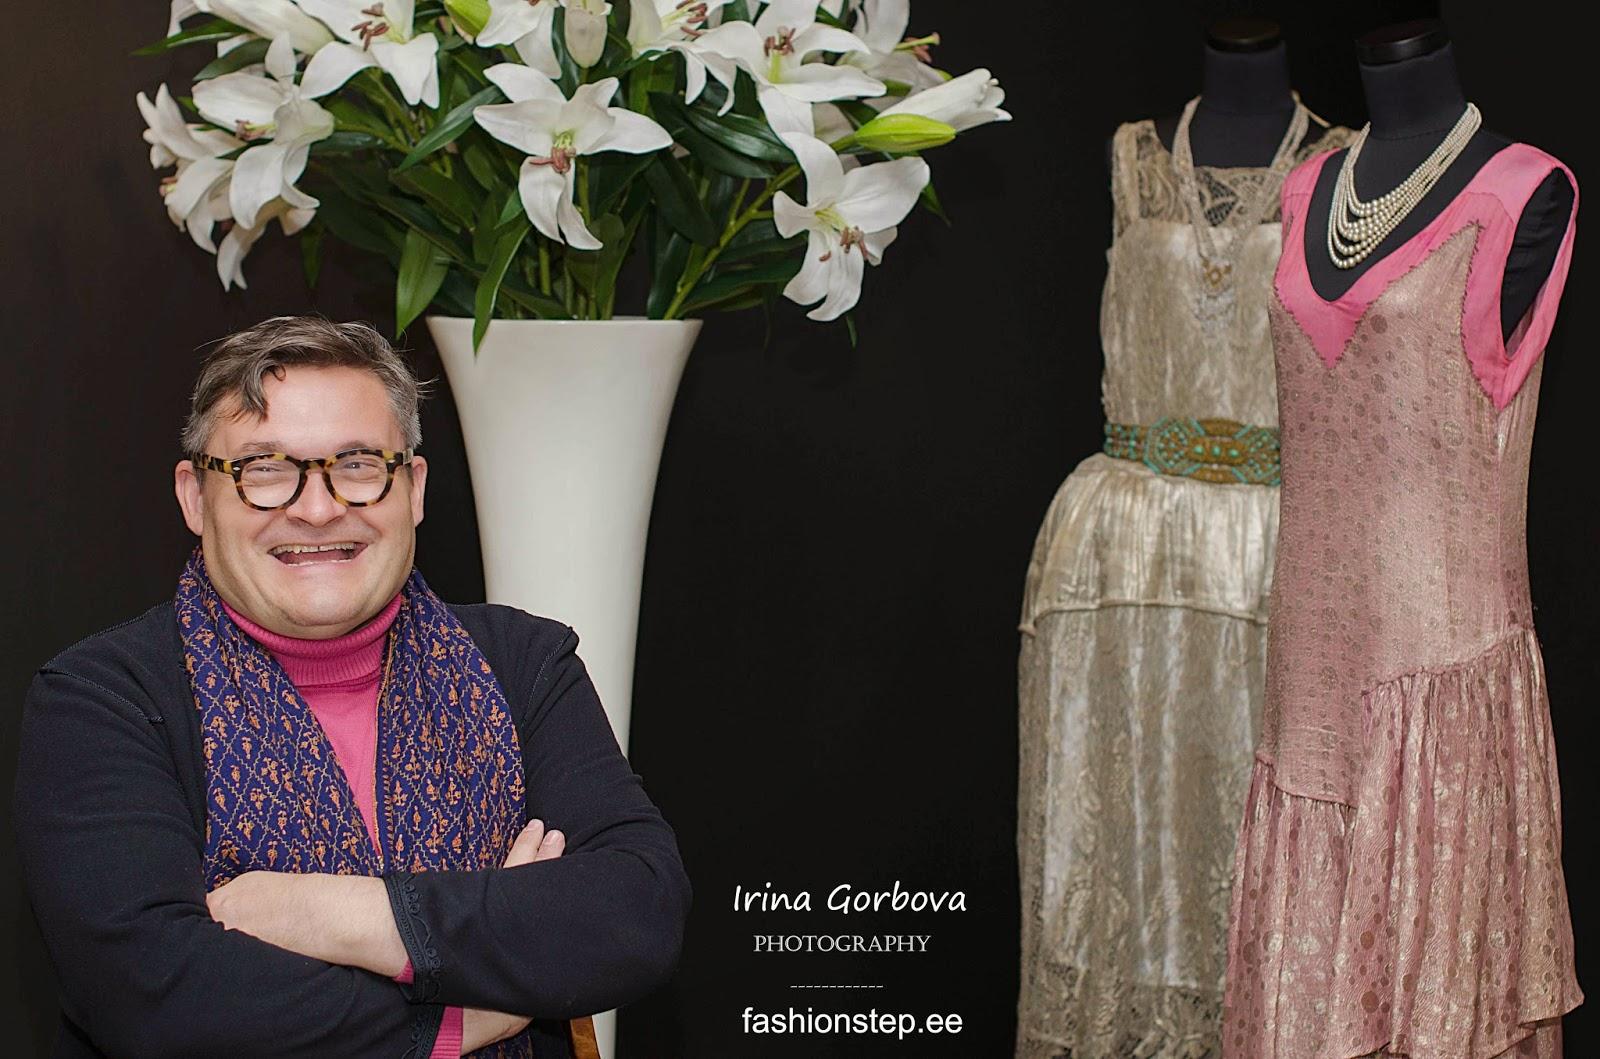 Фото биография васильева историка моды